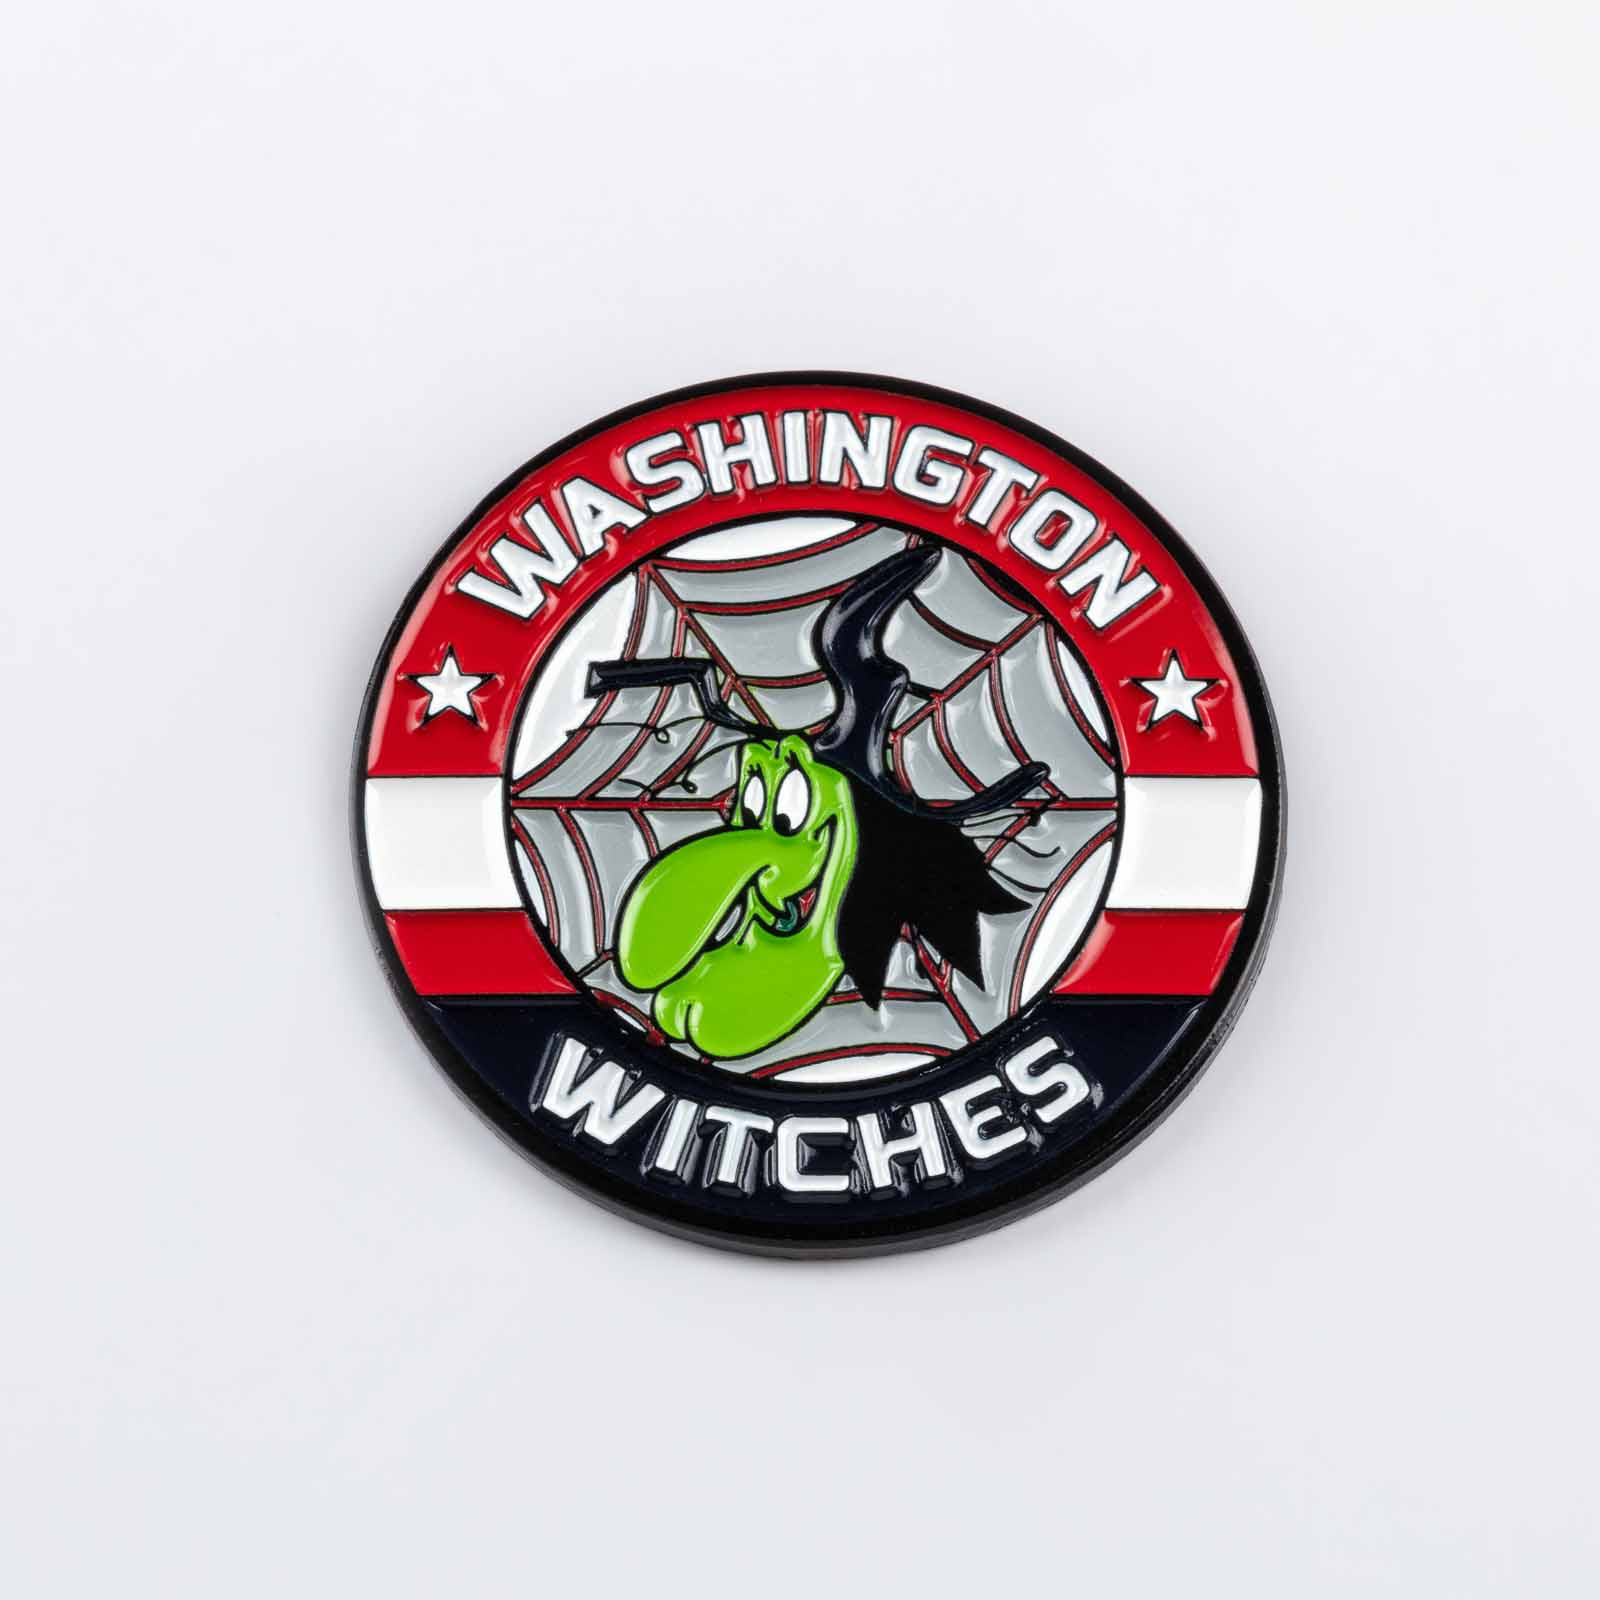 Pin 534 Washington Witches product photography